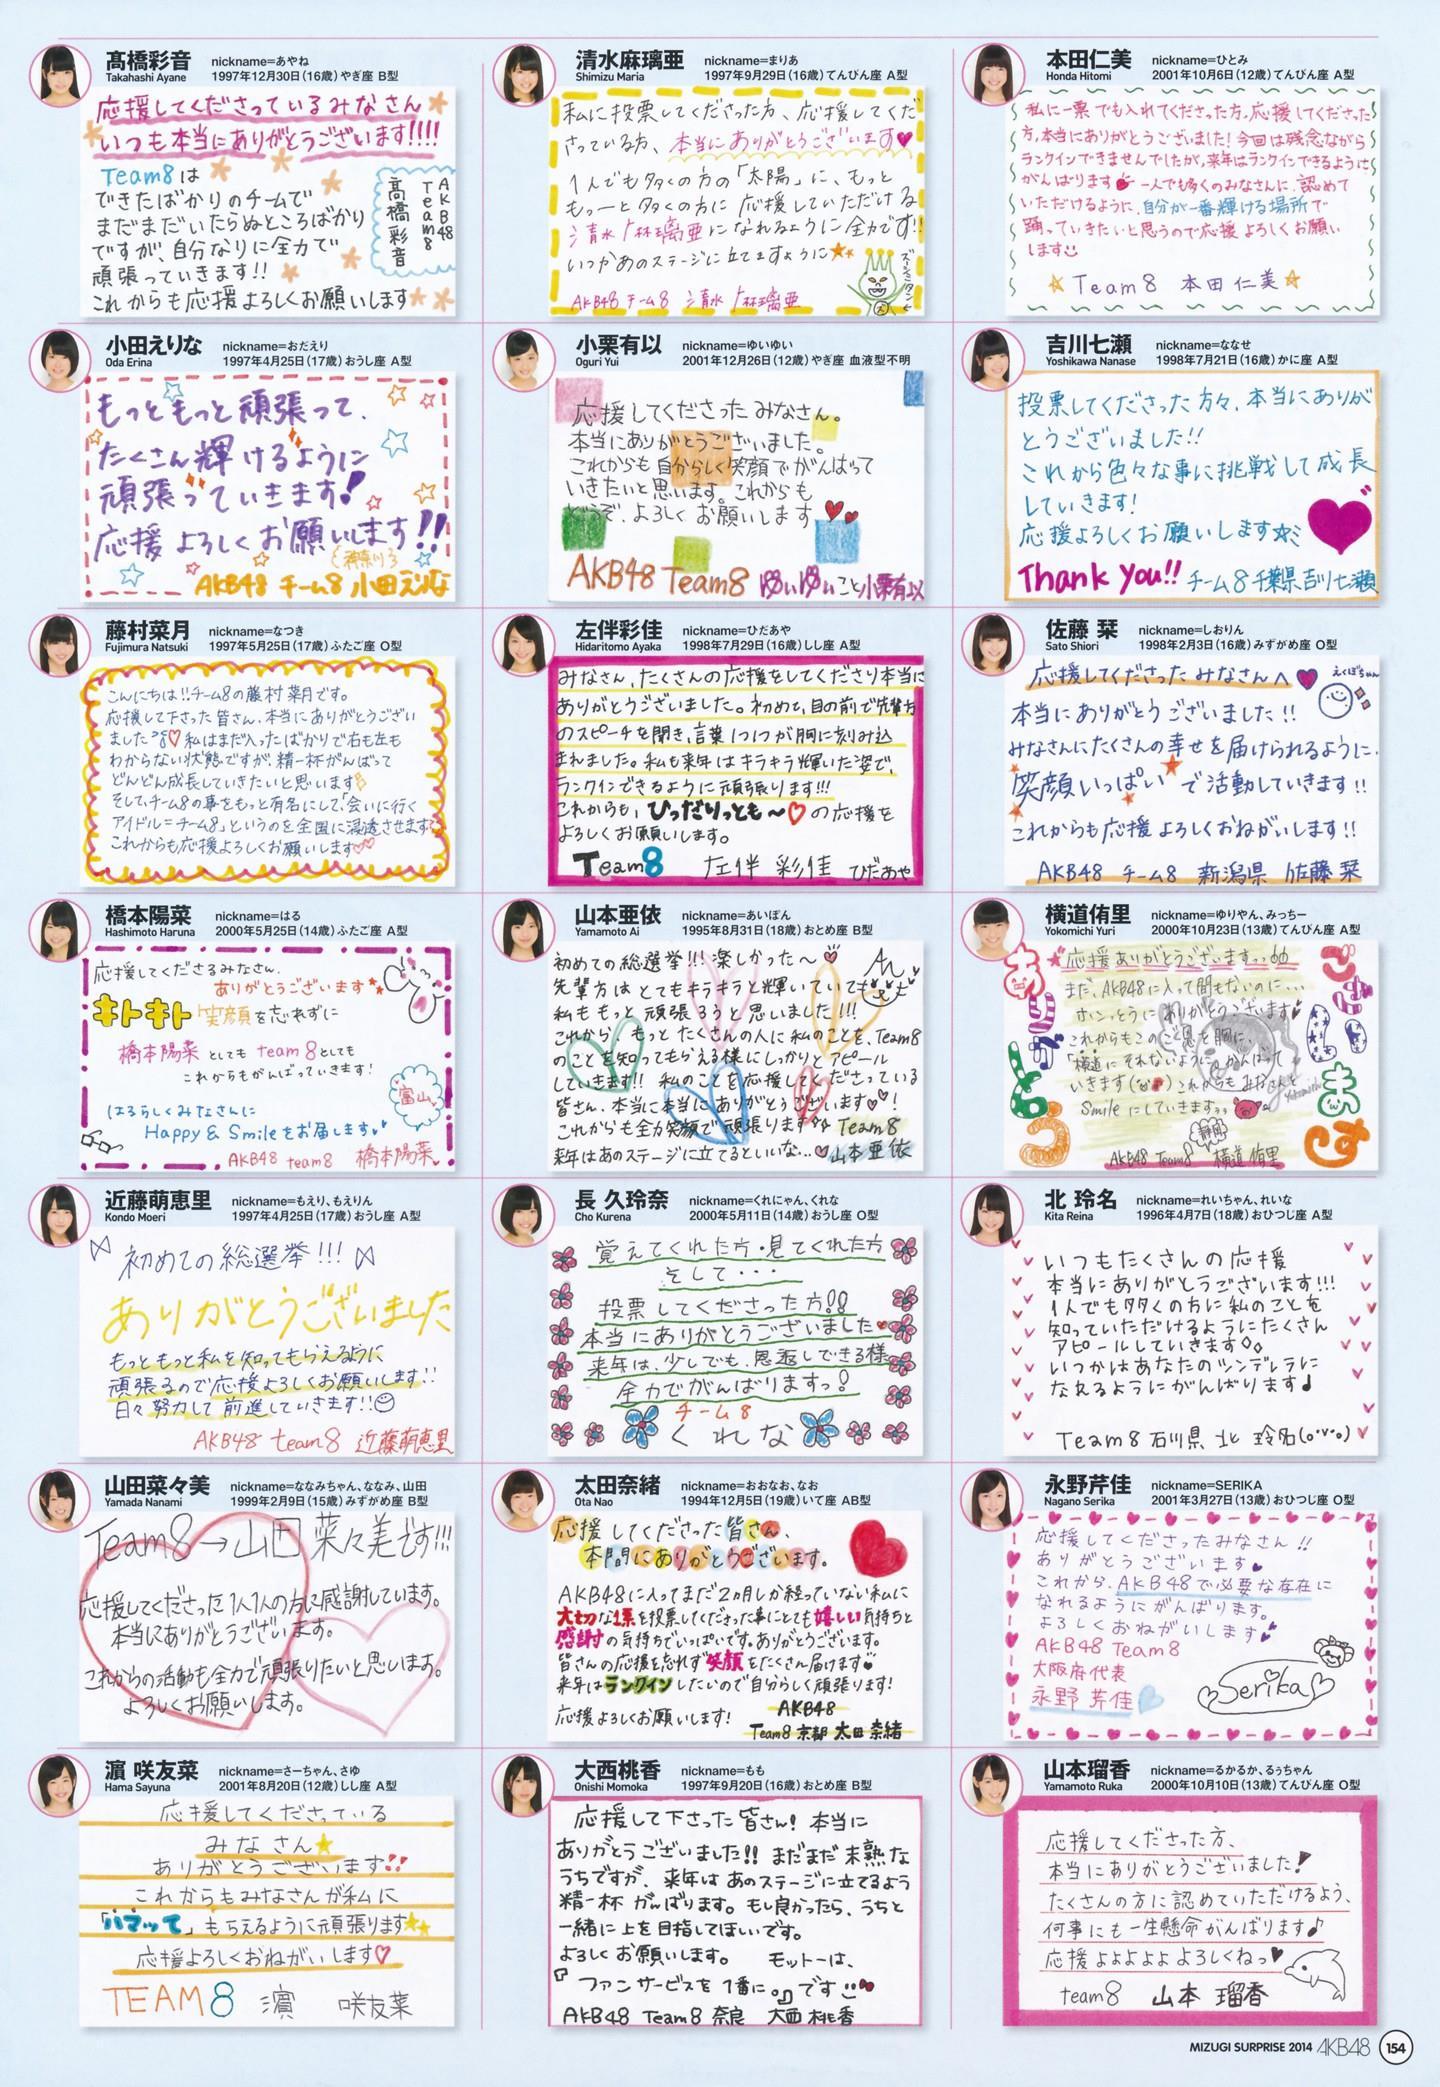 AKB48人気メンバー 画像 141